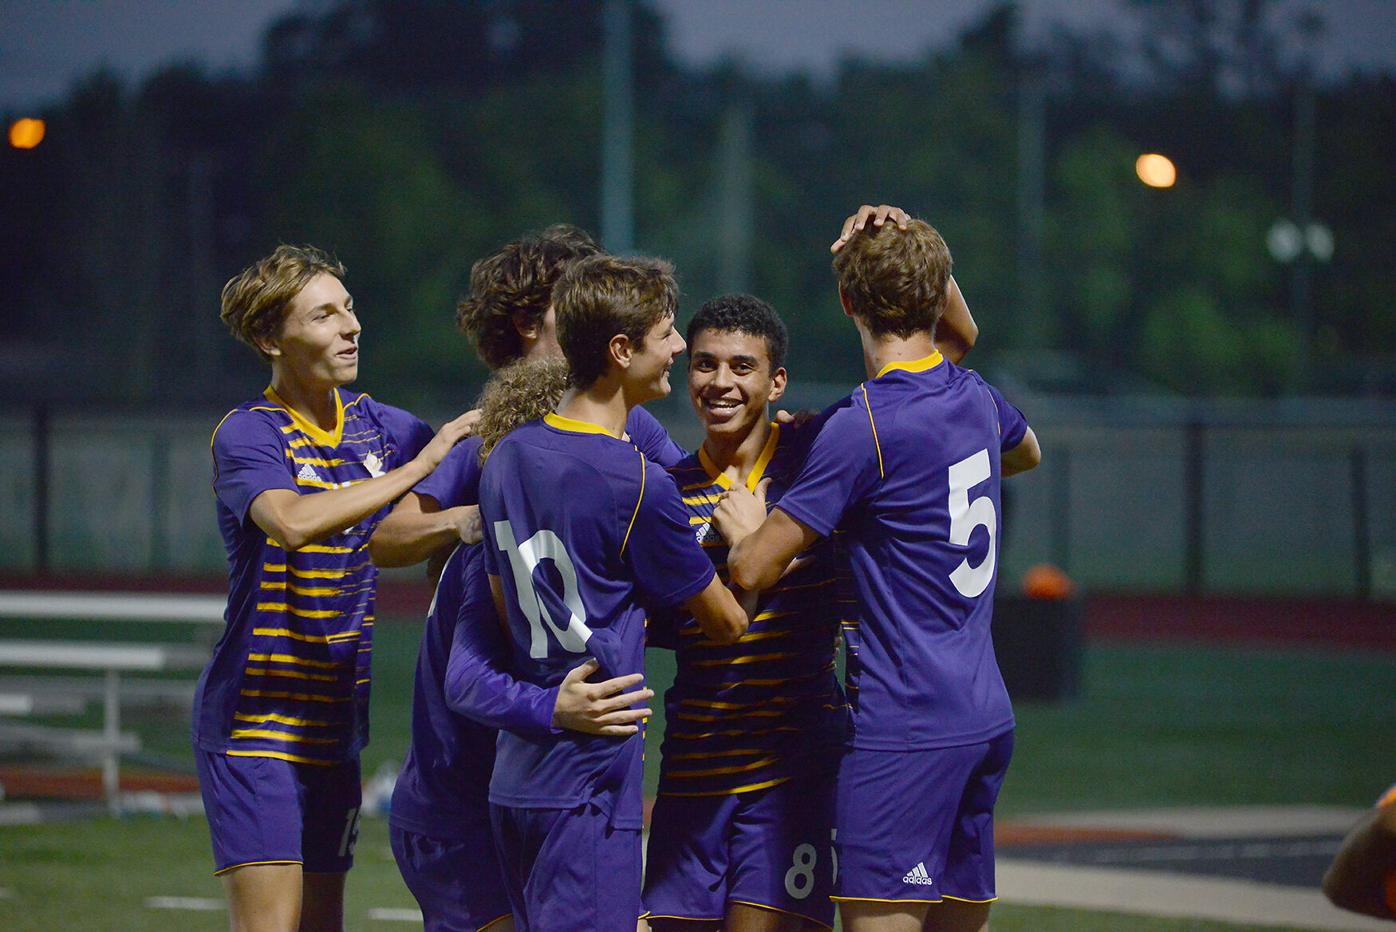 Hickman celebrates the final goal in the boys varsity soccer